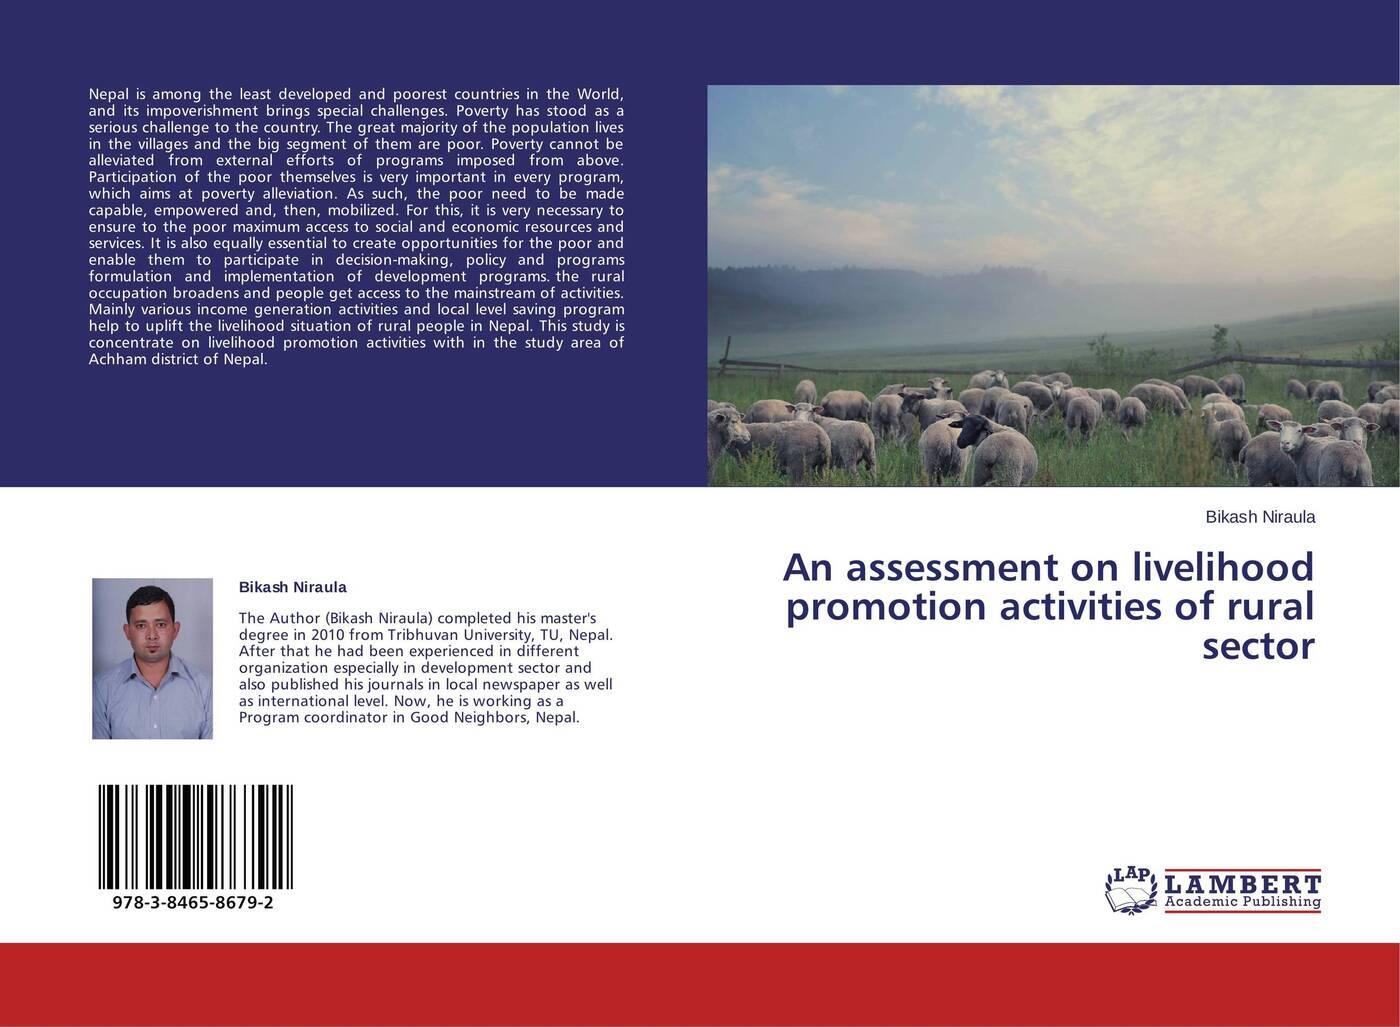 Bikash Niraula An assessment on livelihood promotion activities of rural sector role of social capital in rural livelihood promotion